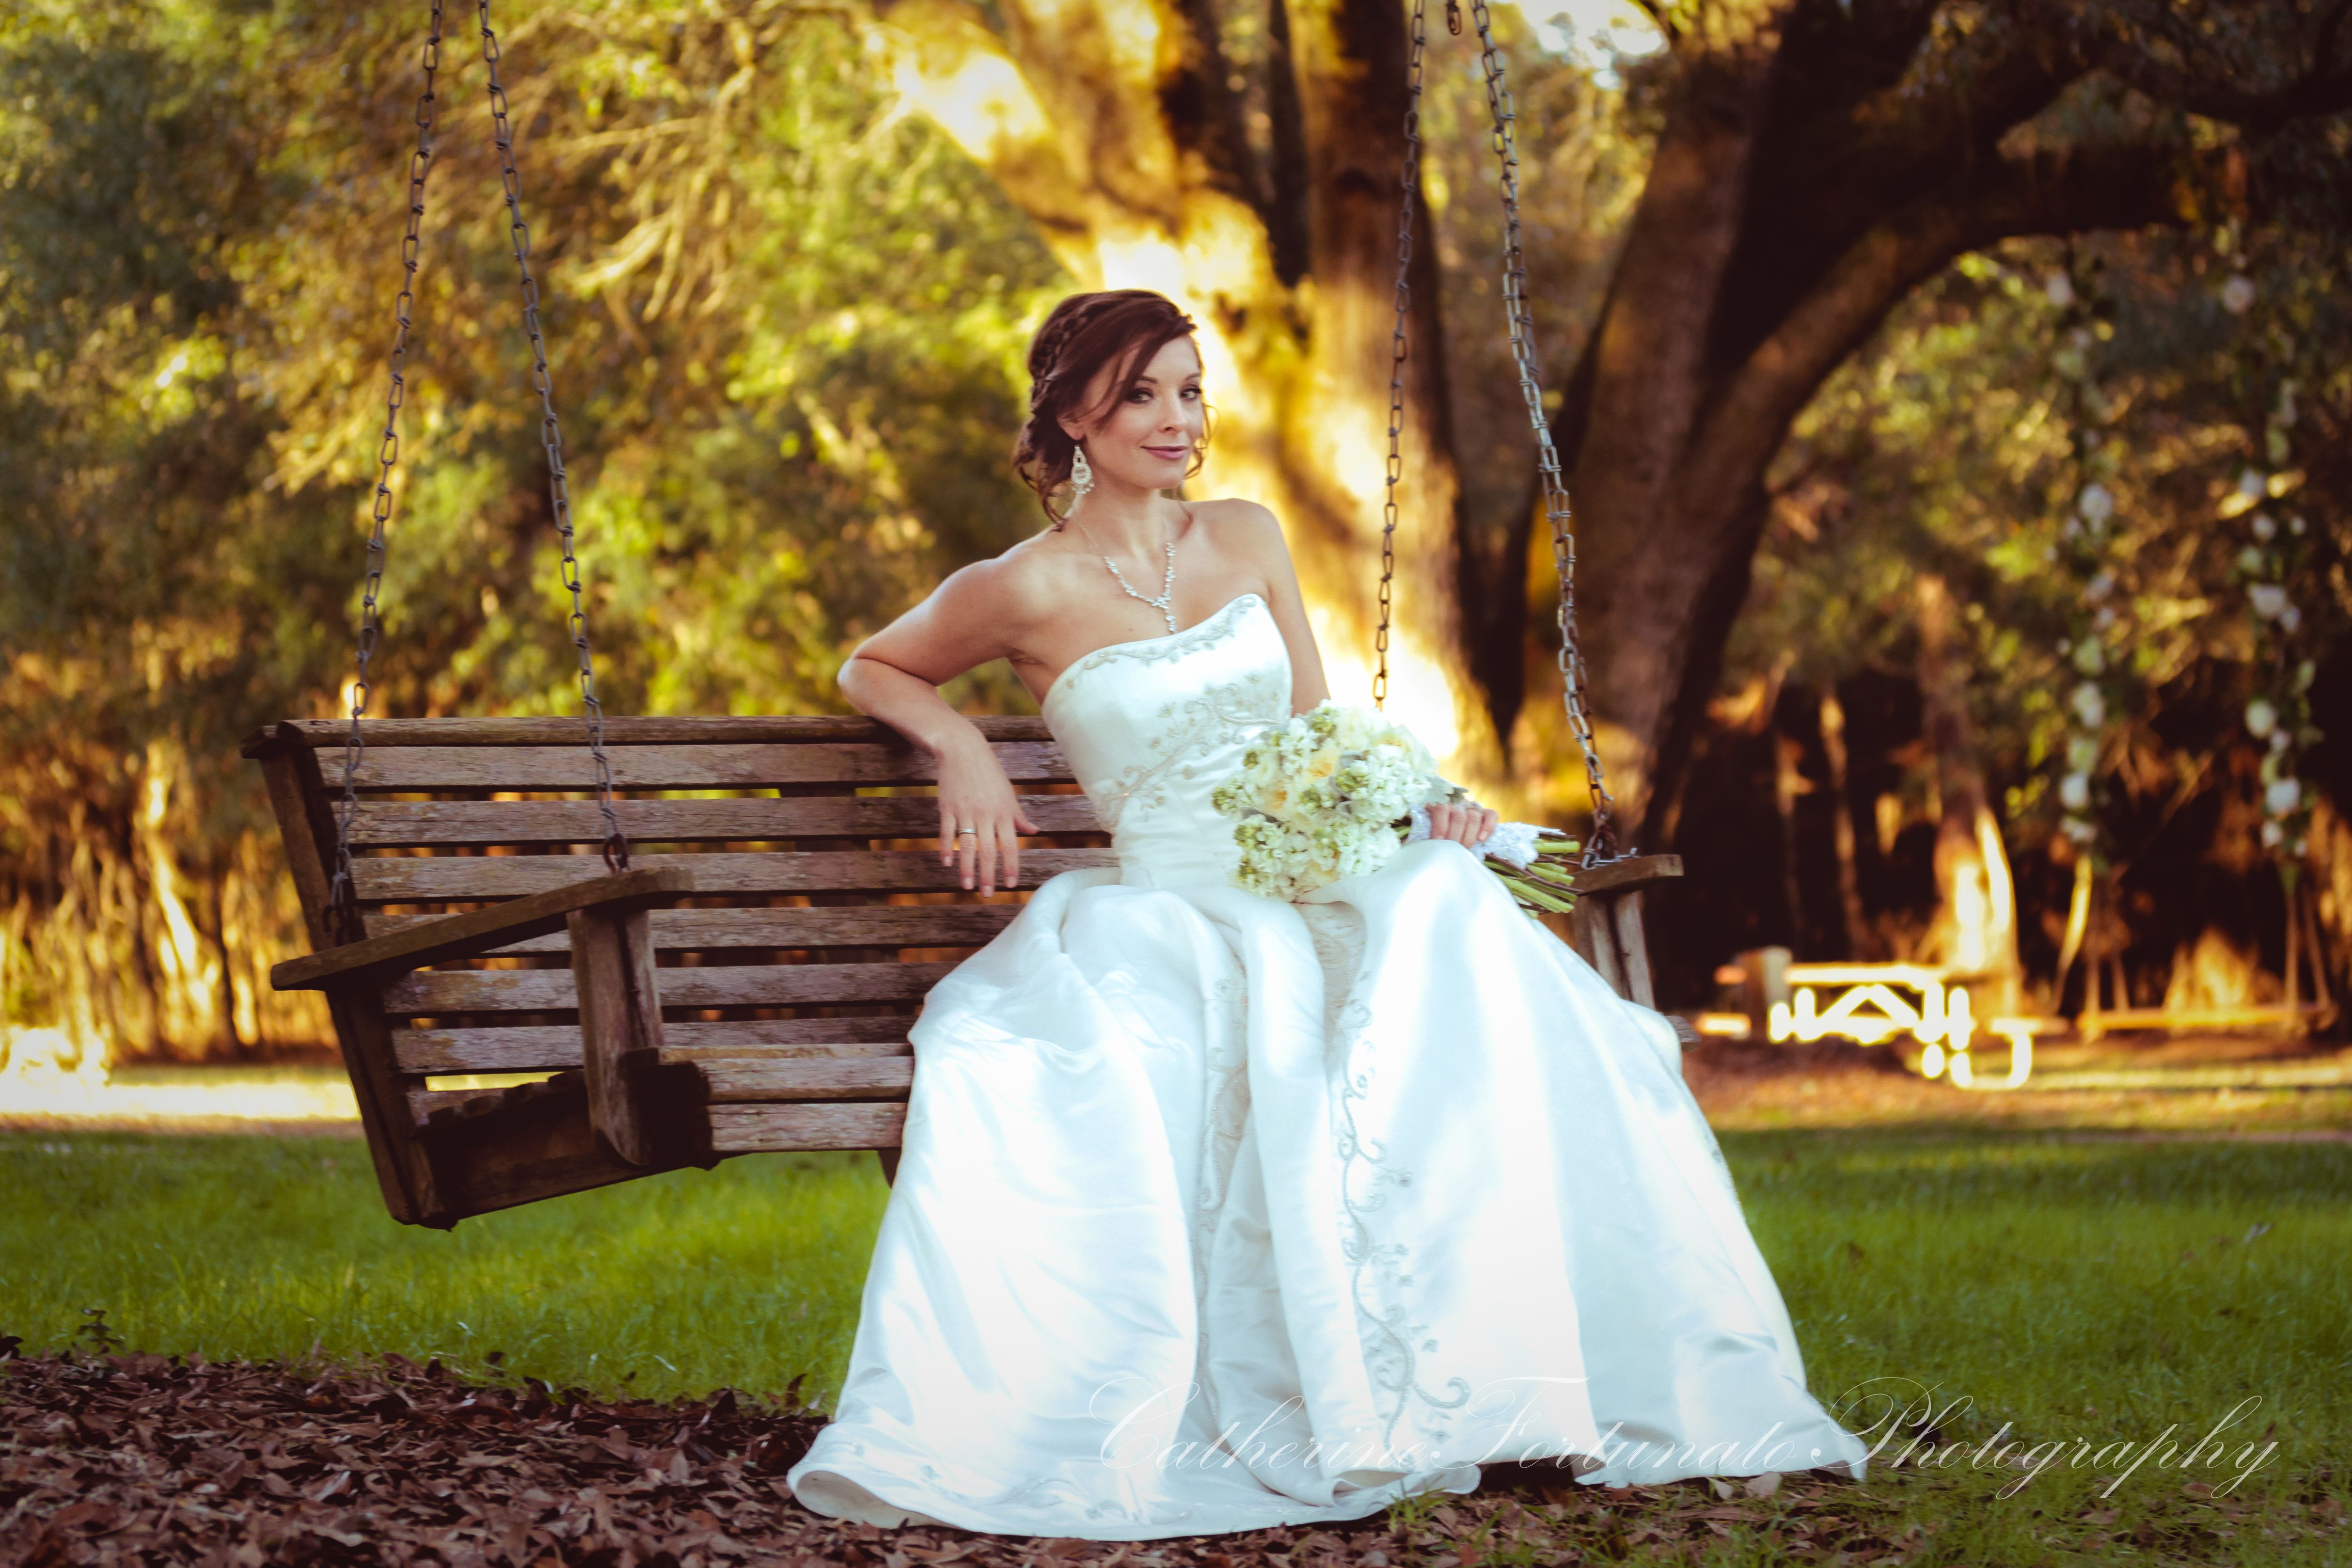 Florida gulf coast wedding photographer. Serving florida and beyond